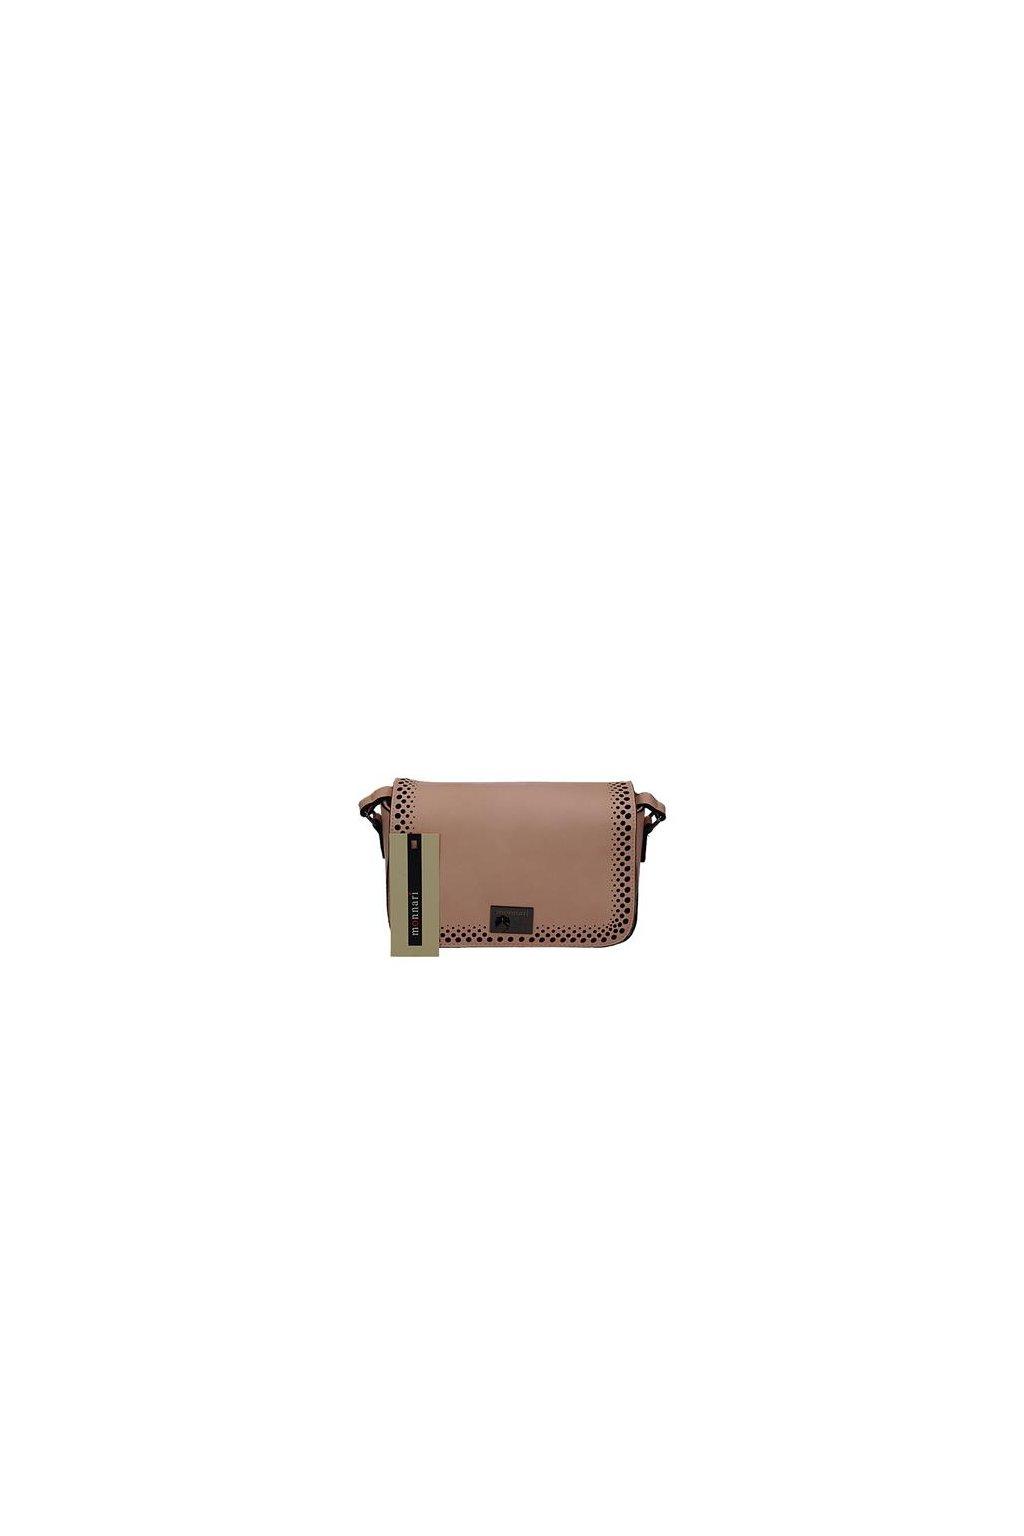 Ružová crossbody kabelka MONNARI BAG W17 4200-004  65f581fb2f8